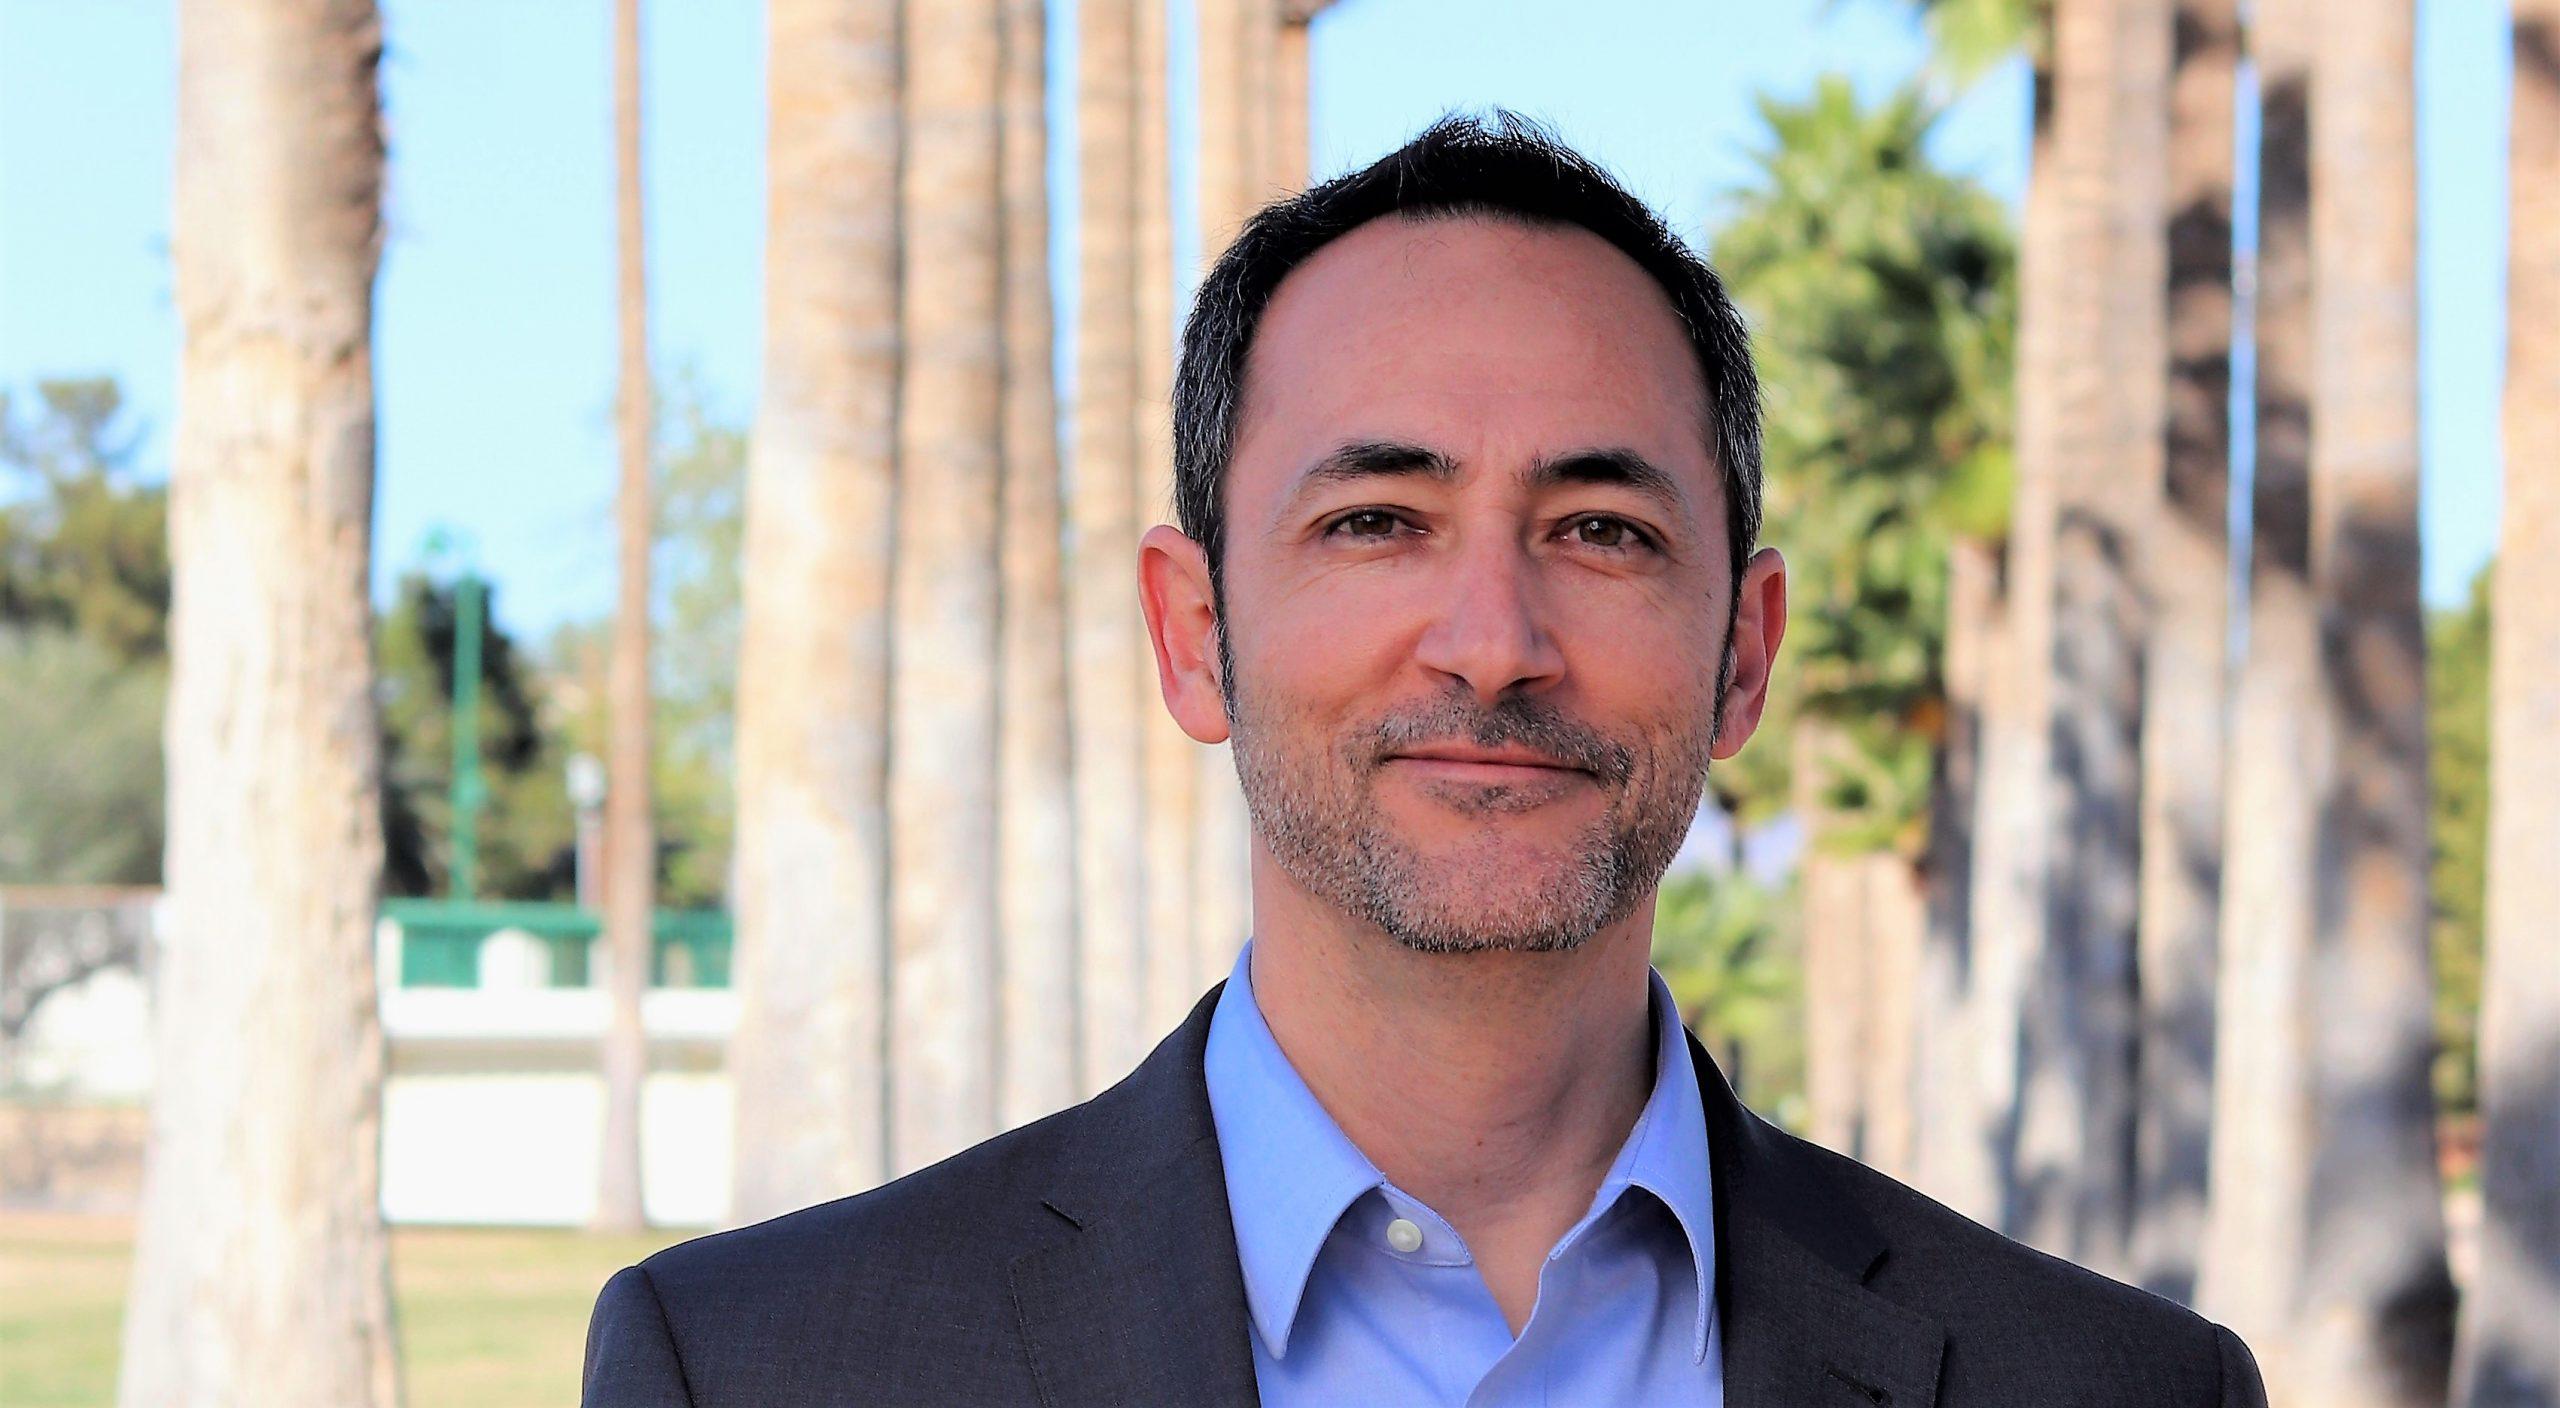 Domingo Degrazia, AZ Rep., LD10